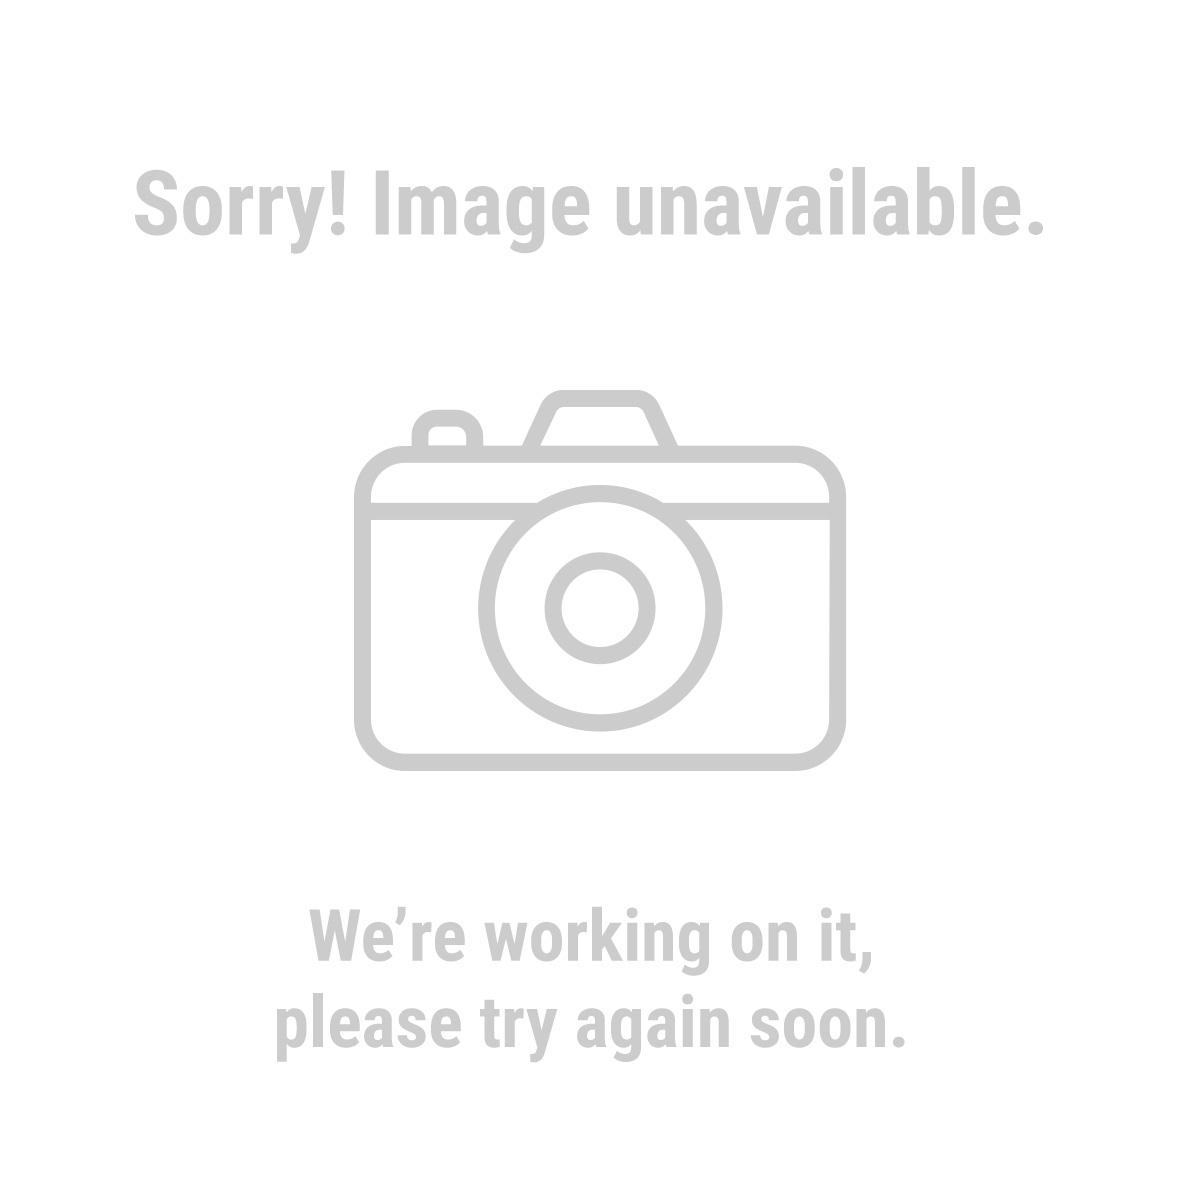 HFT 93670 50 Ft. 10 Gauge Triple Tap Extension Cord